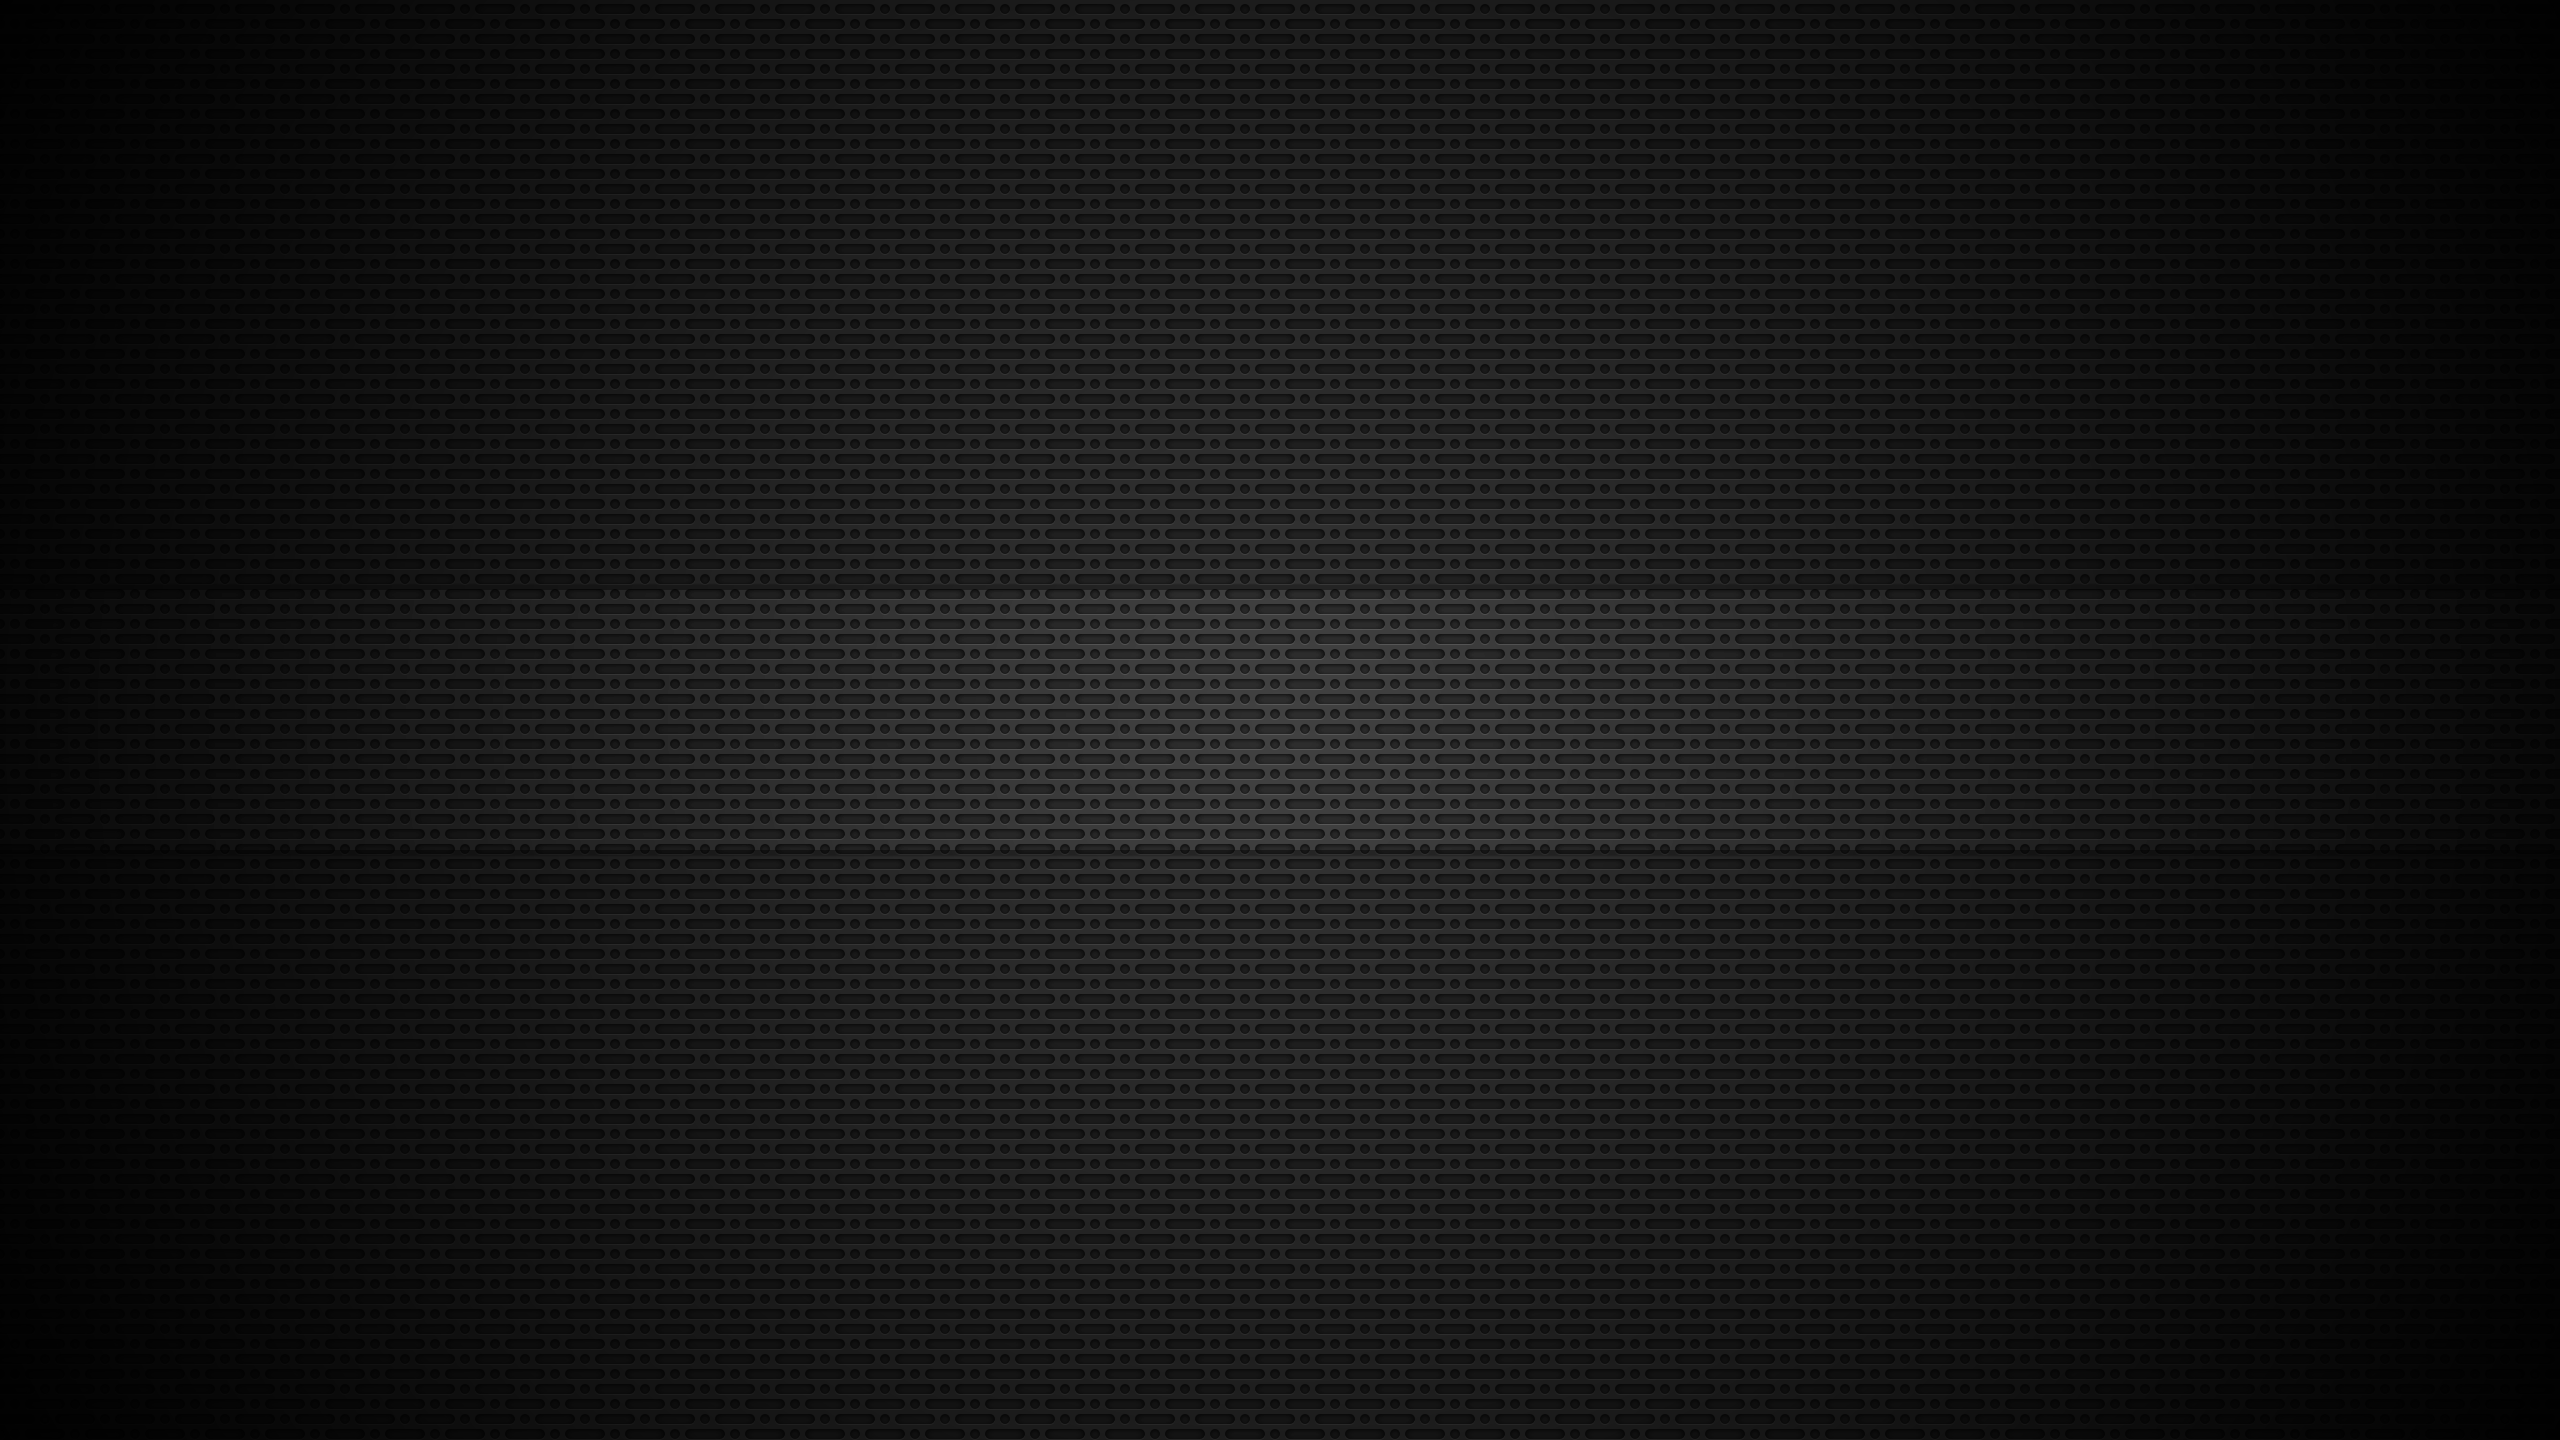 20 YouTube One Channel Art Designs TubeGeeks 2560x1440